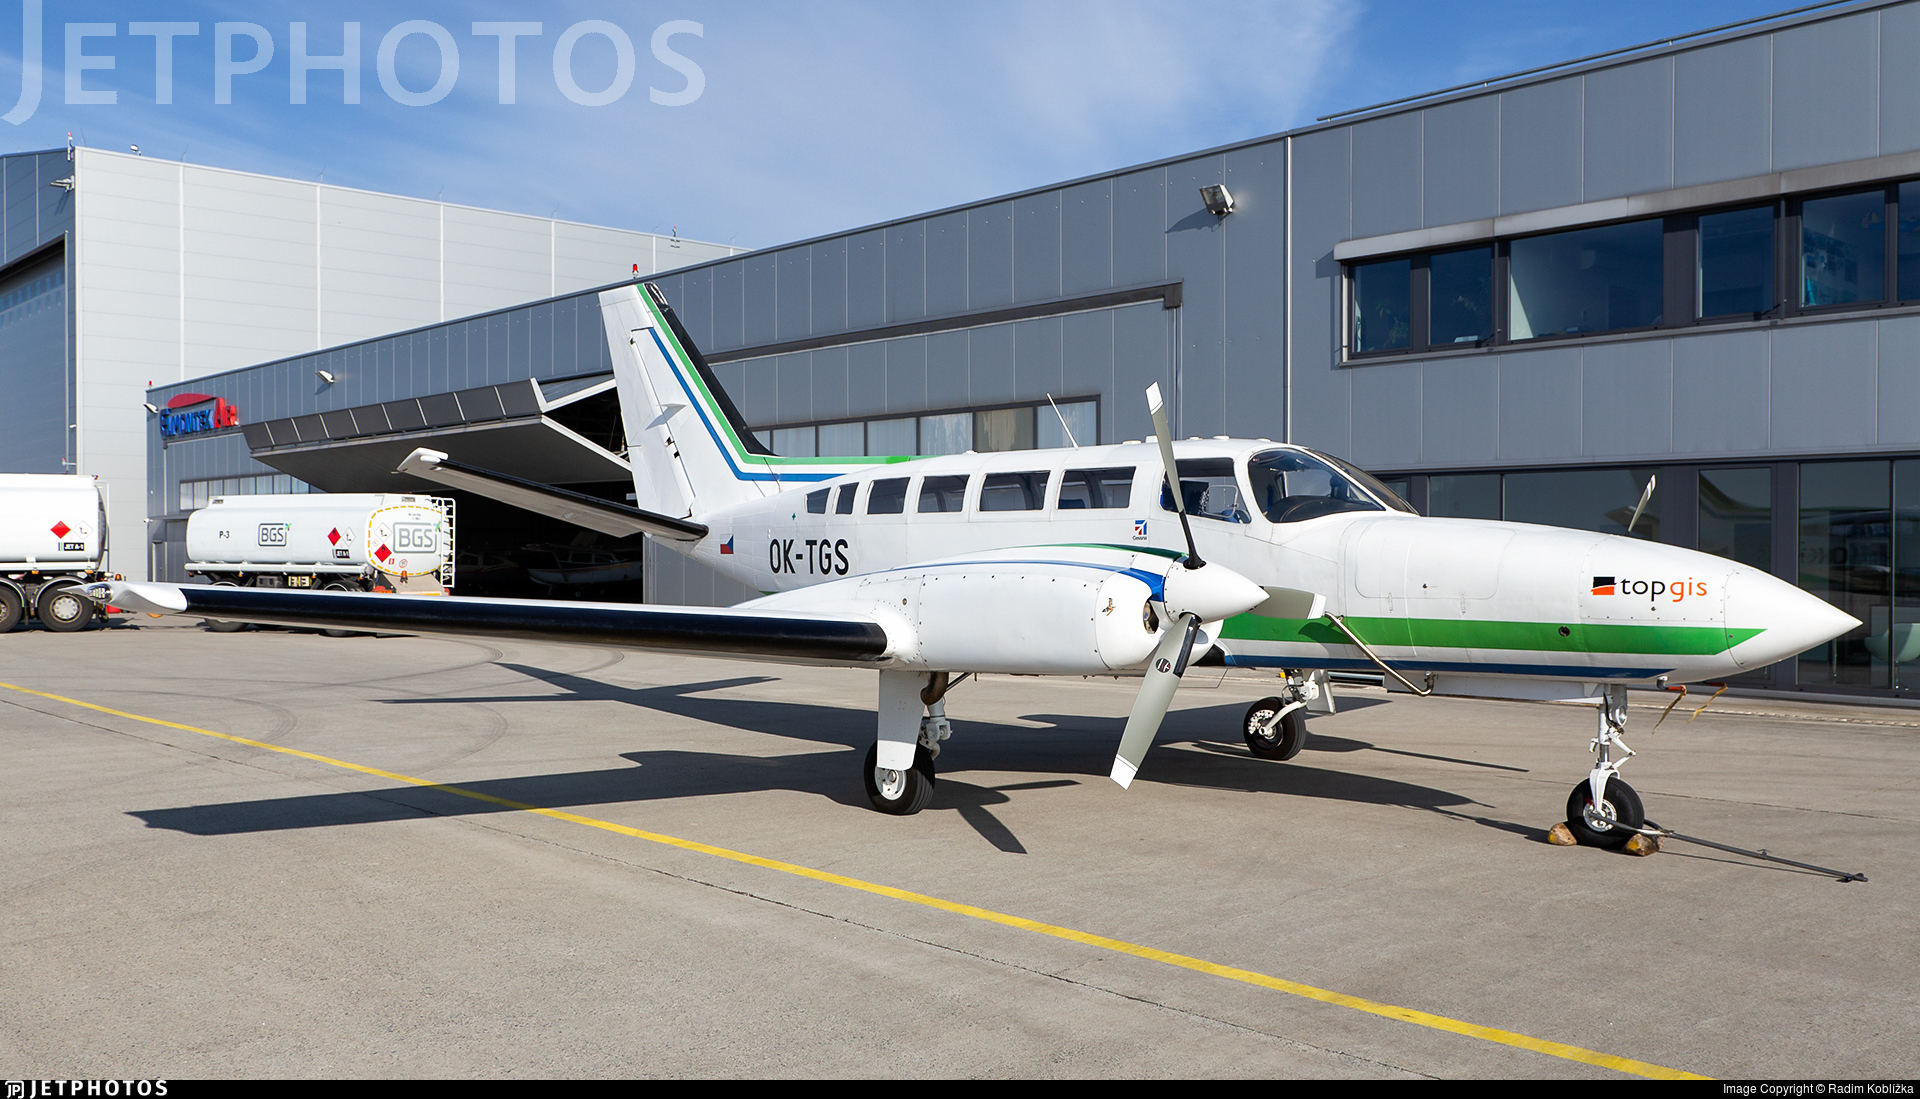 OK-TGS - Cessna 404 Titan - TopGis